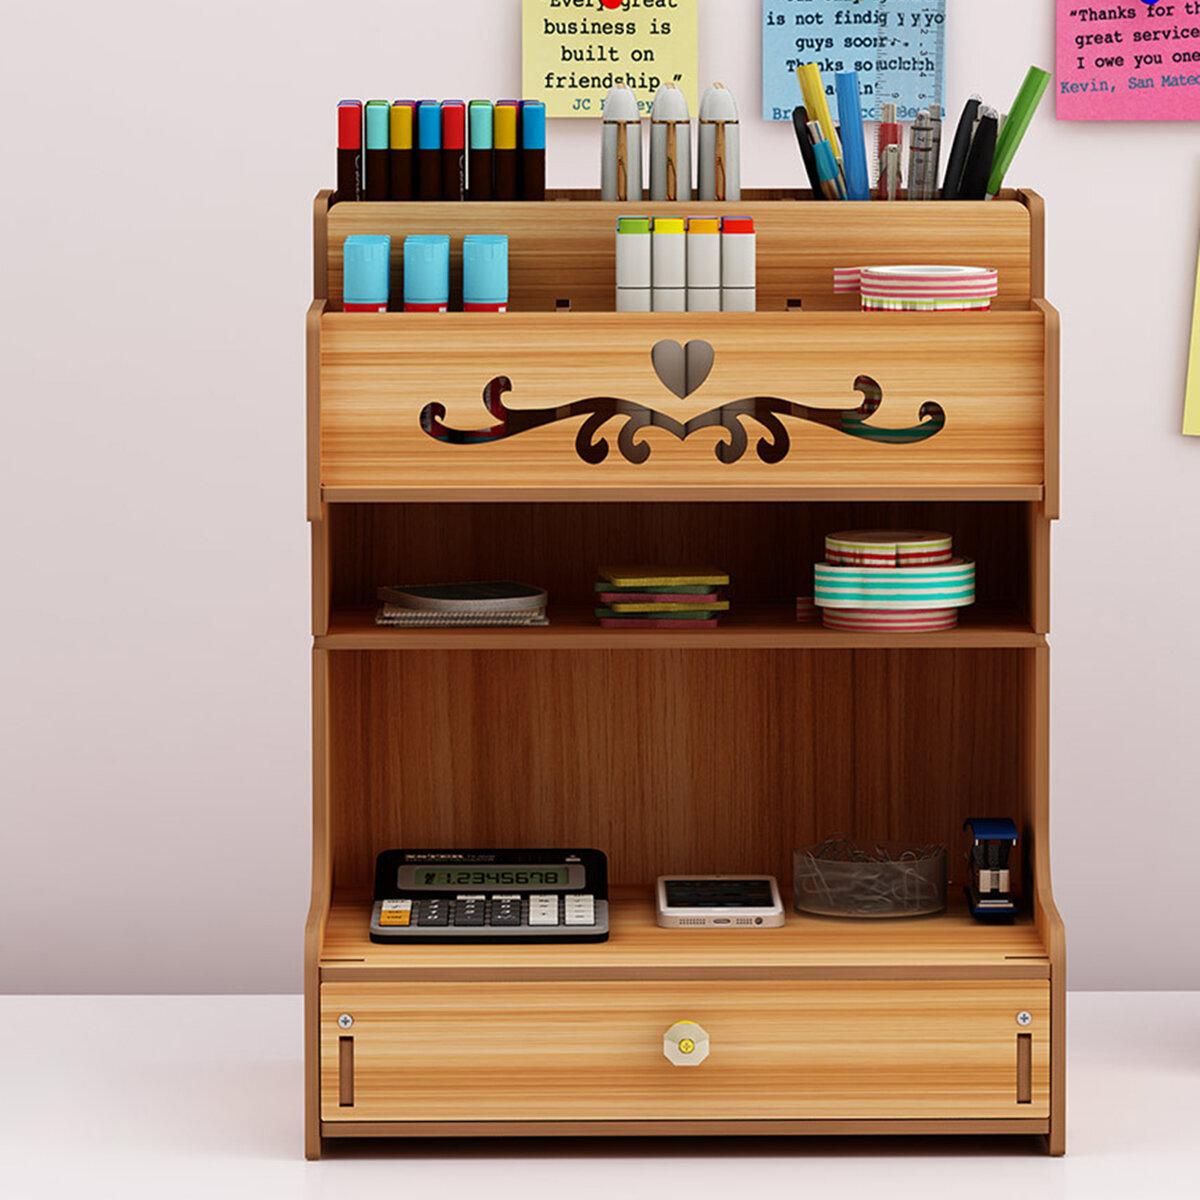 Wooden Desk Organizer Multi-Functional DIY Pen Holder Box Cell Phone Holder Desktop Stationary Home Office Supplies Storage Rack with Drawer